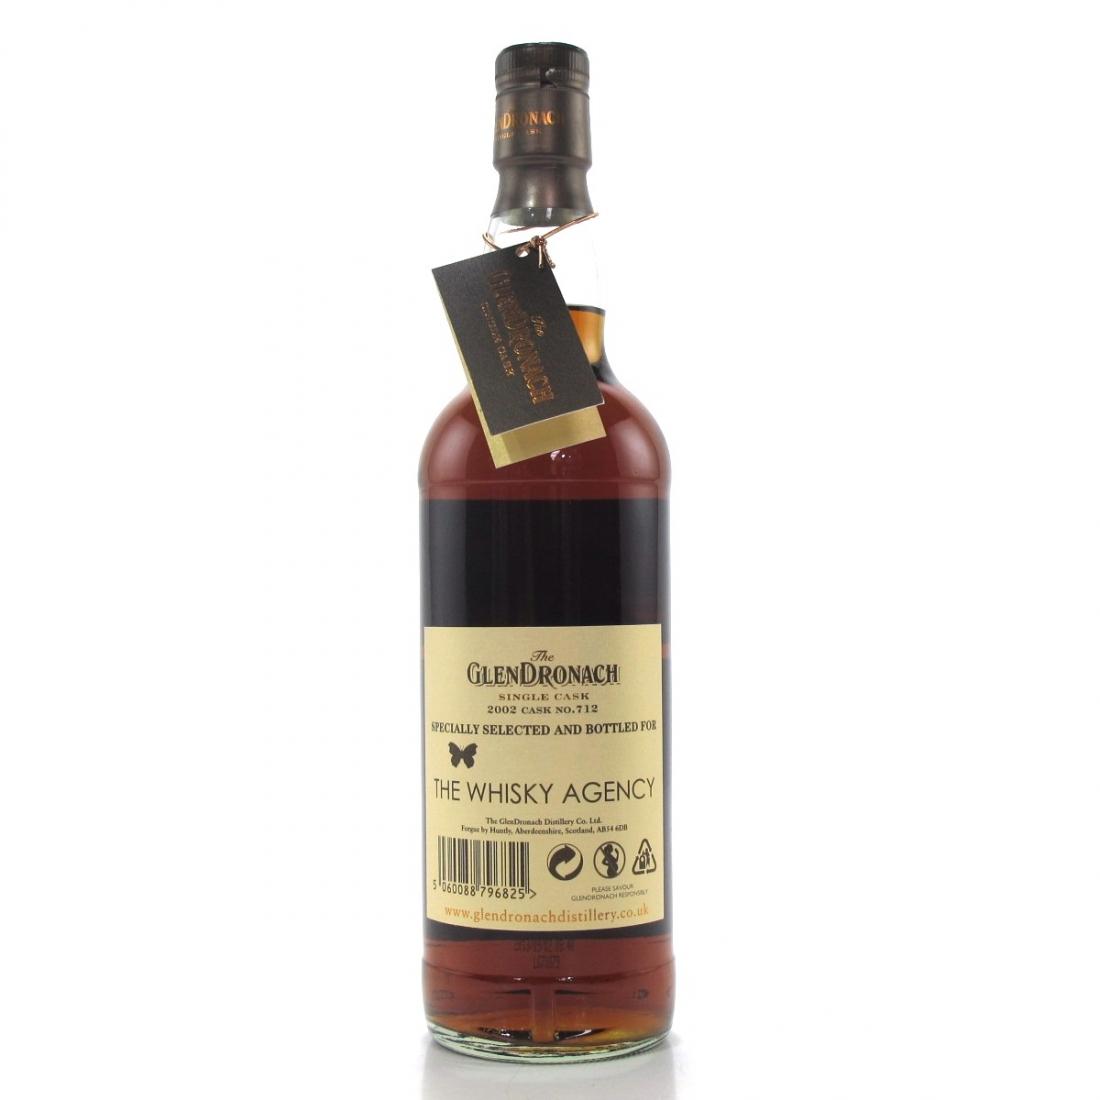 Glendronach 2002 Single Cask 11 Year Old #712 / The Whisky Agency